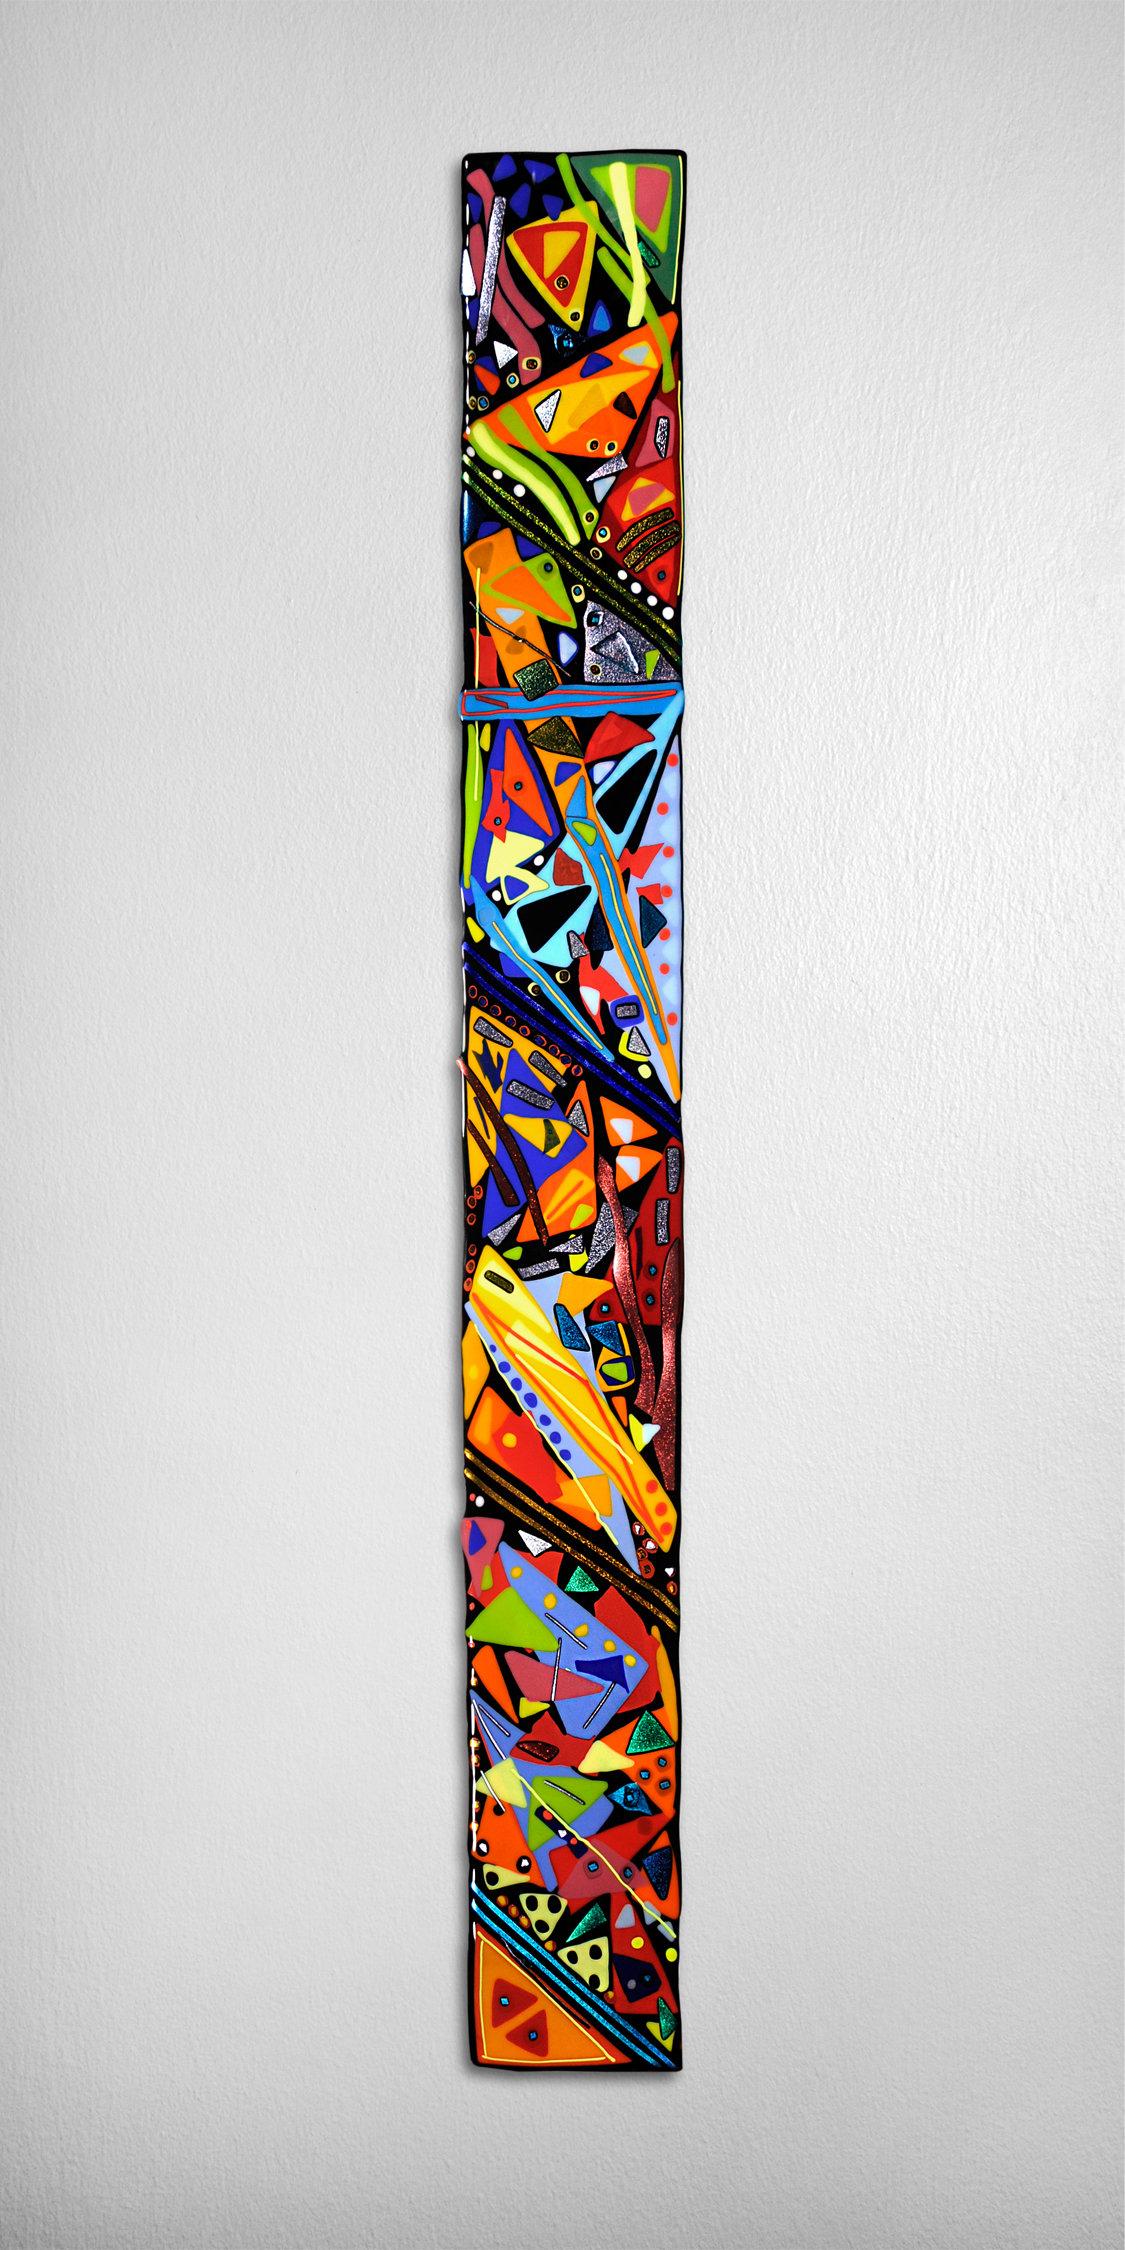 Mardi Gras Wall Panel By Helen Rudy Art Glass Wall Sculpture Arte Abstracto De Pared Arte De La Pared De Mosaico Arte Moderno Pintura